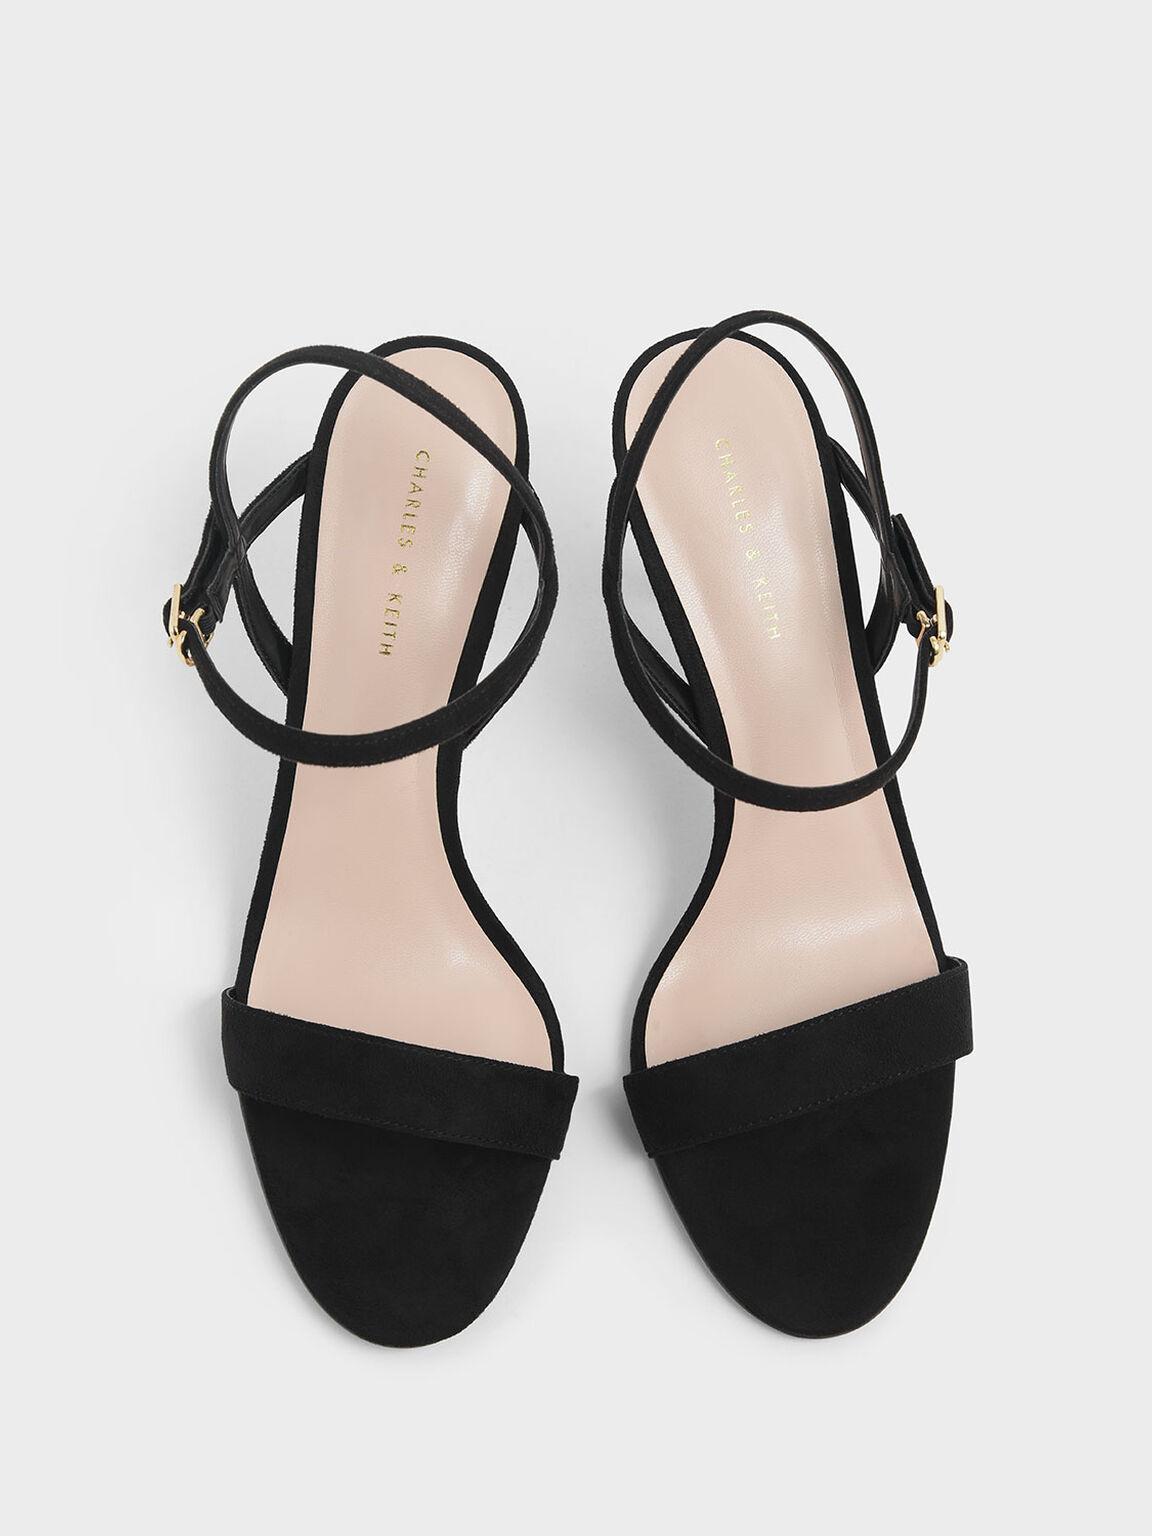 Sandal Tumit Stiletto Klasik Bertekstur, Black, hi-res